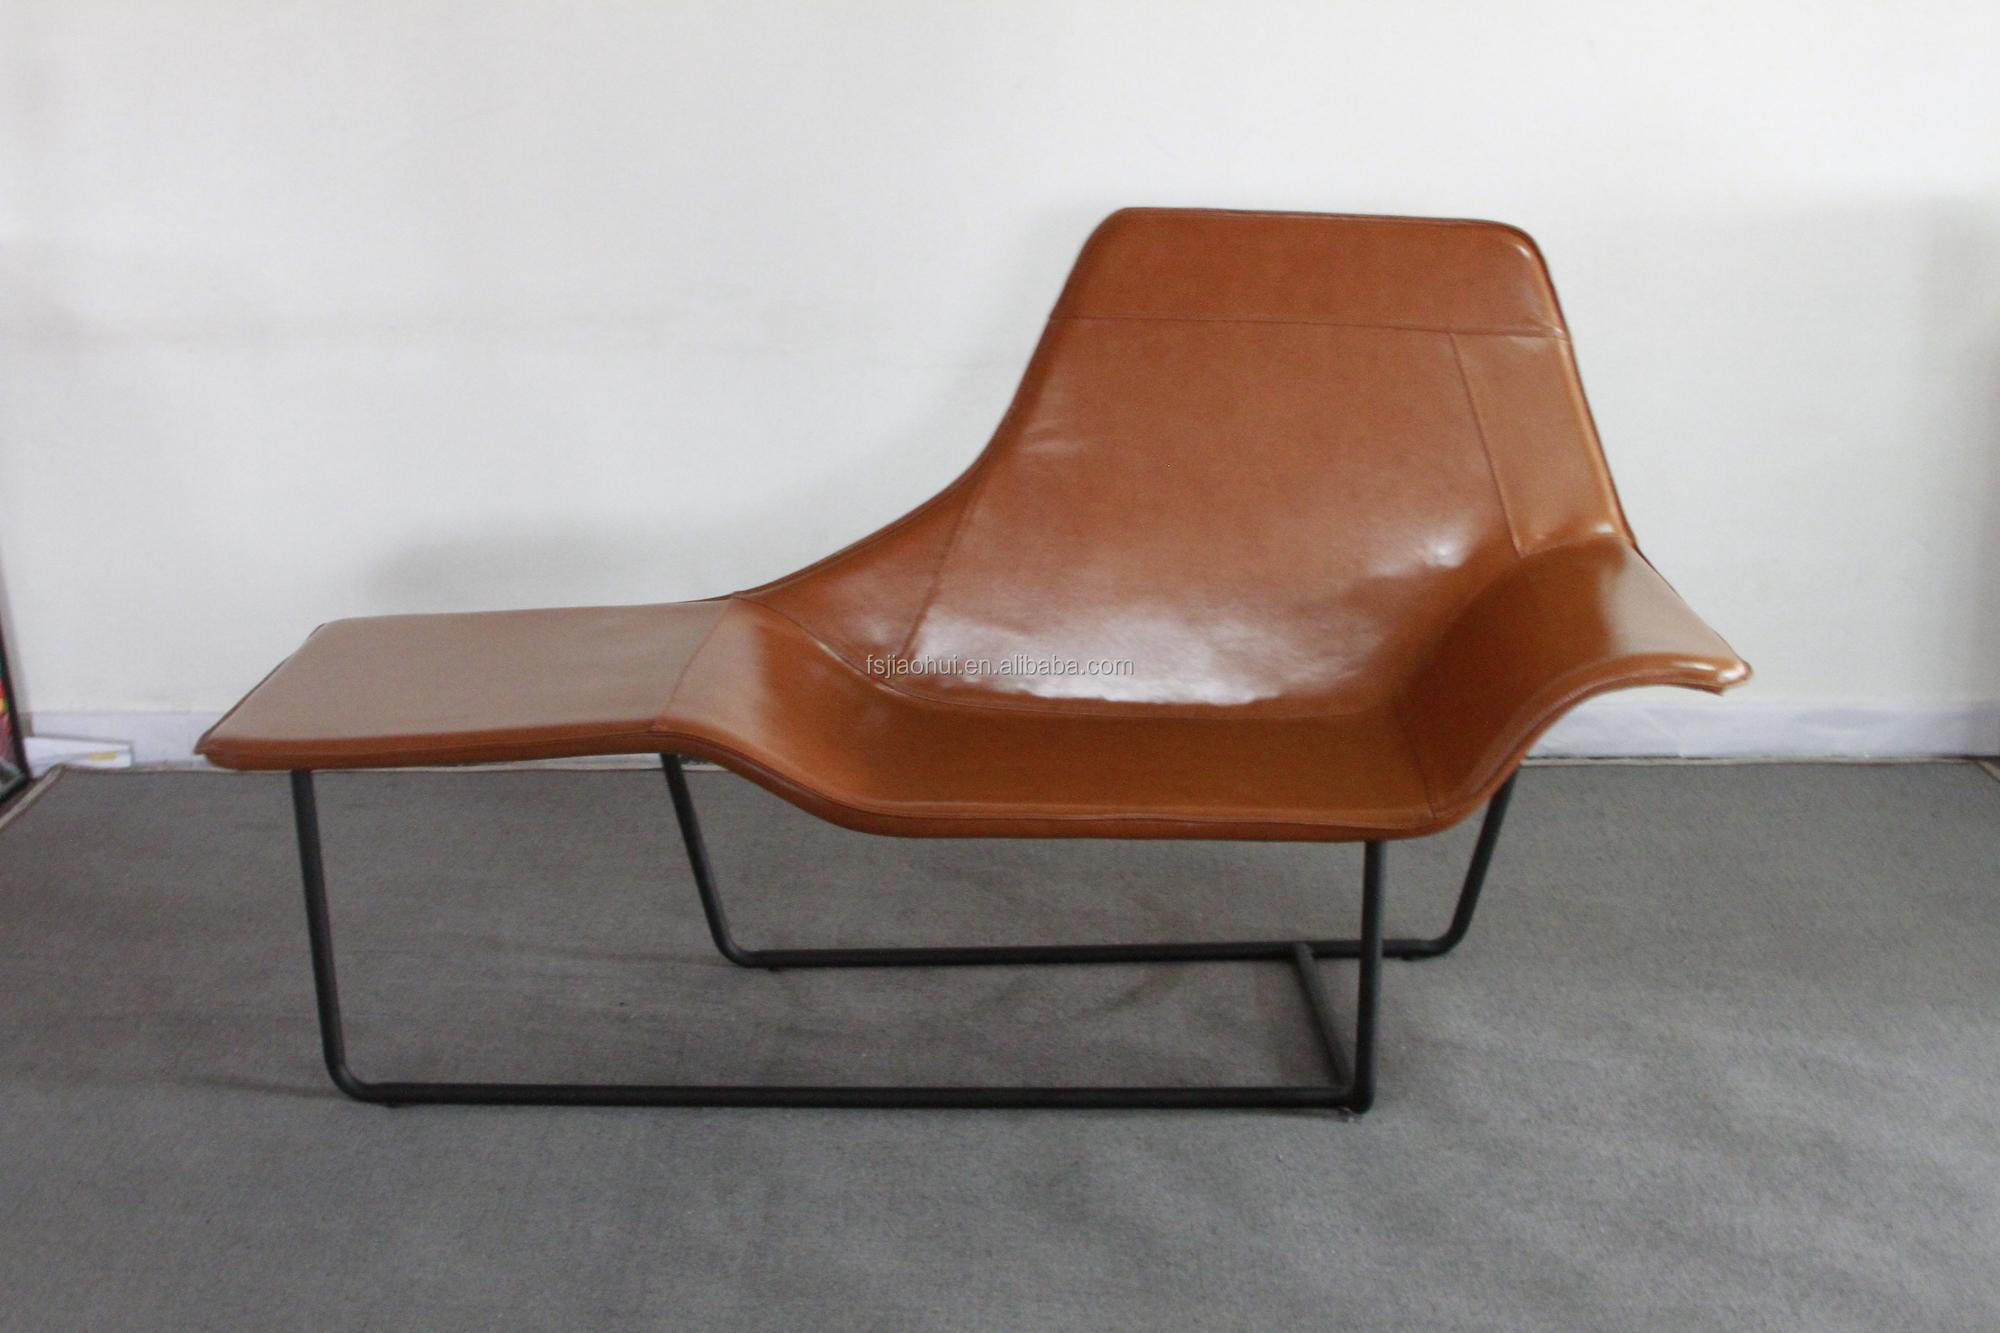 Amazing Vintage Style Home Furniture Zanotta Lama Genuine Leather Lounge Chair View Zanotta Lama Lounge Chair Jiaohui Product Details From Foshan Jiaohui Beatyapartments Chair Design Images Beatyapartmentscom